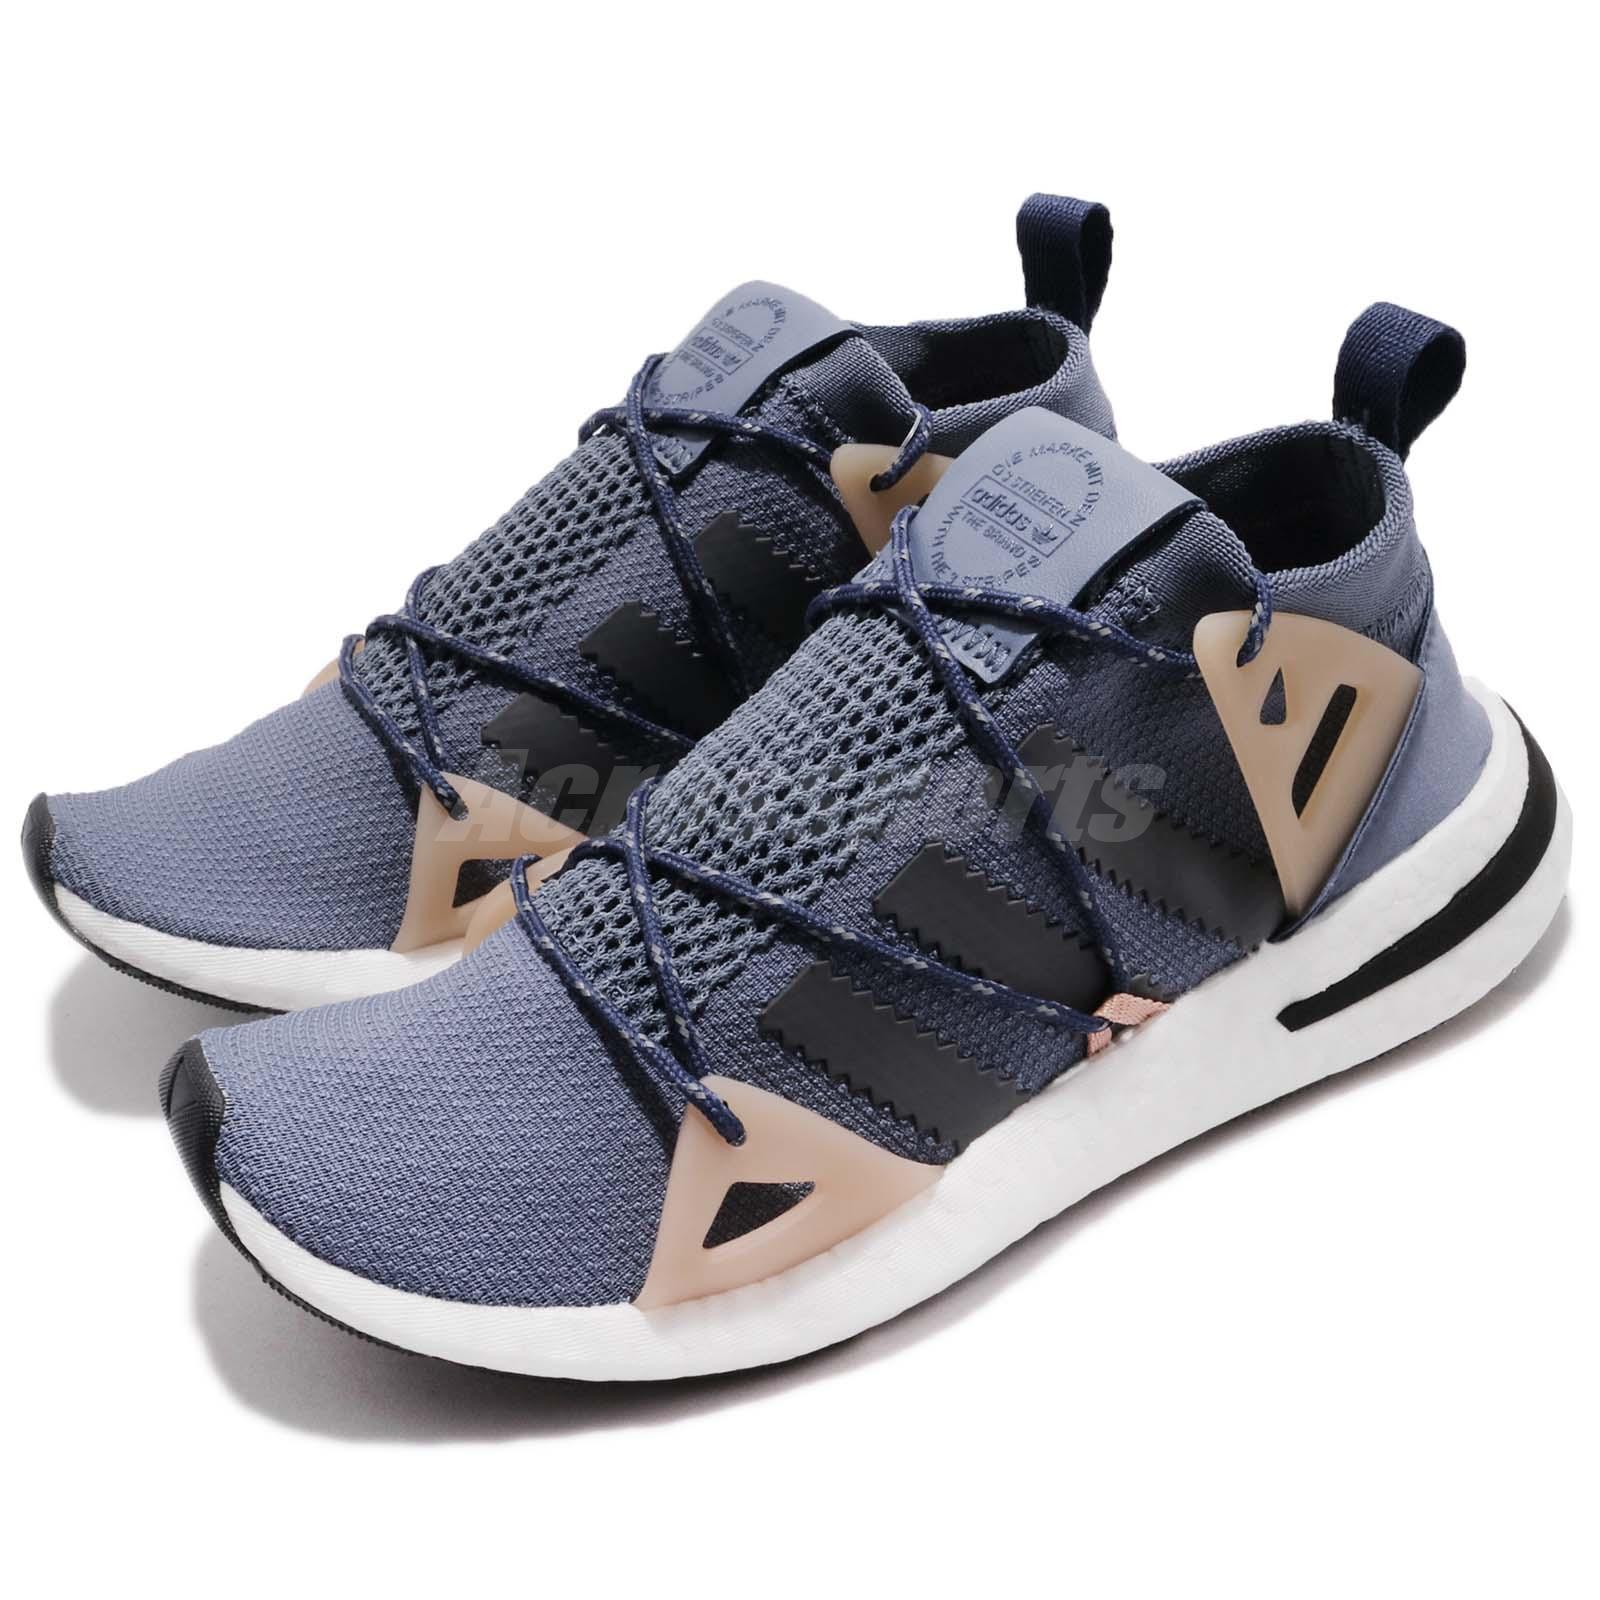 new concept f04b9 0362c Details about adidas Originals ARKYN W Steel Grey Ash Pearl Women Running  Shoes Sneaker DA9606